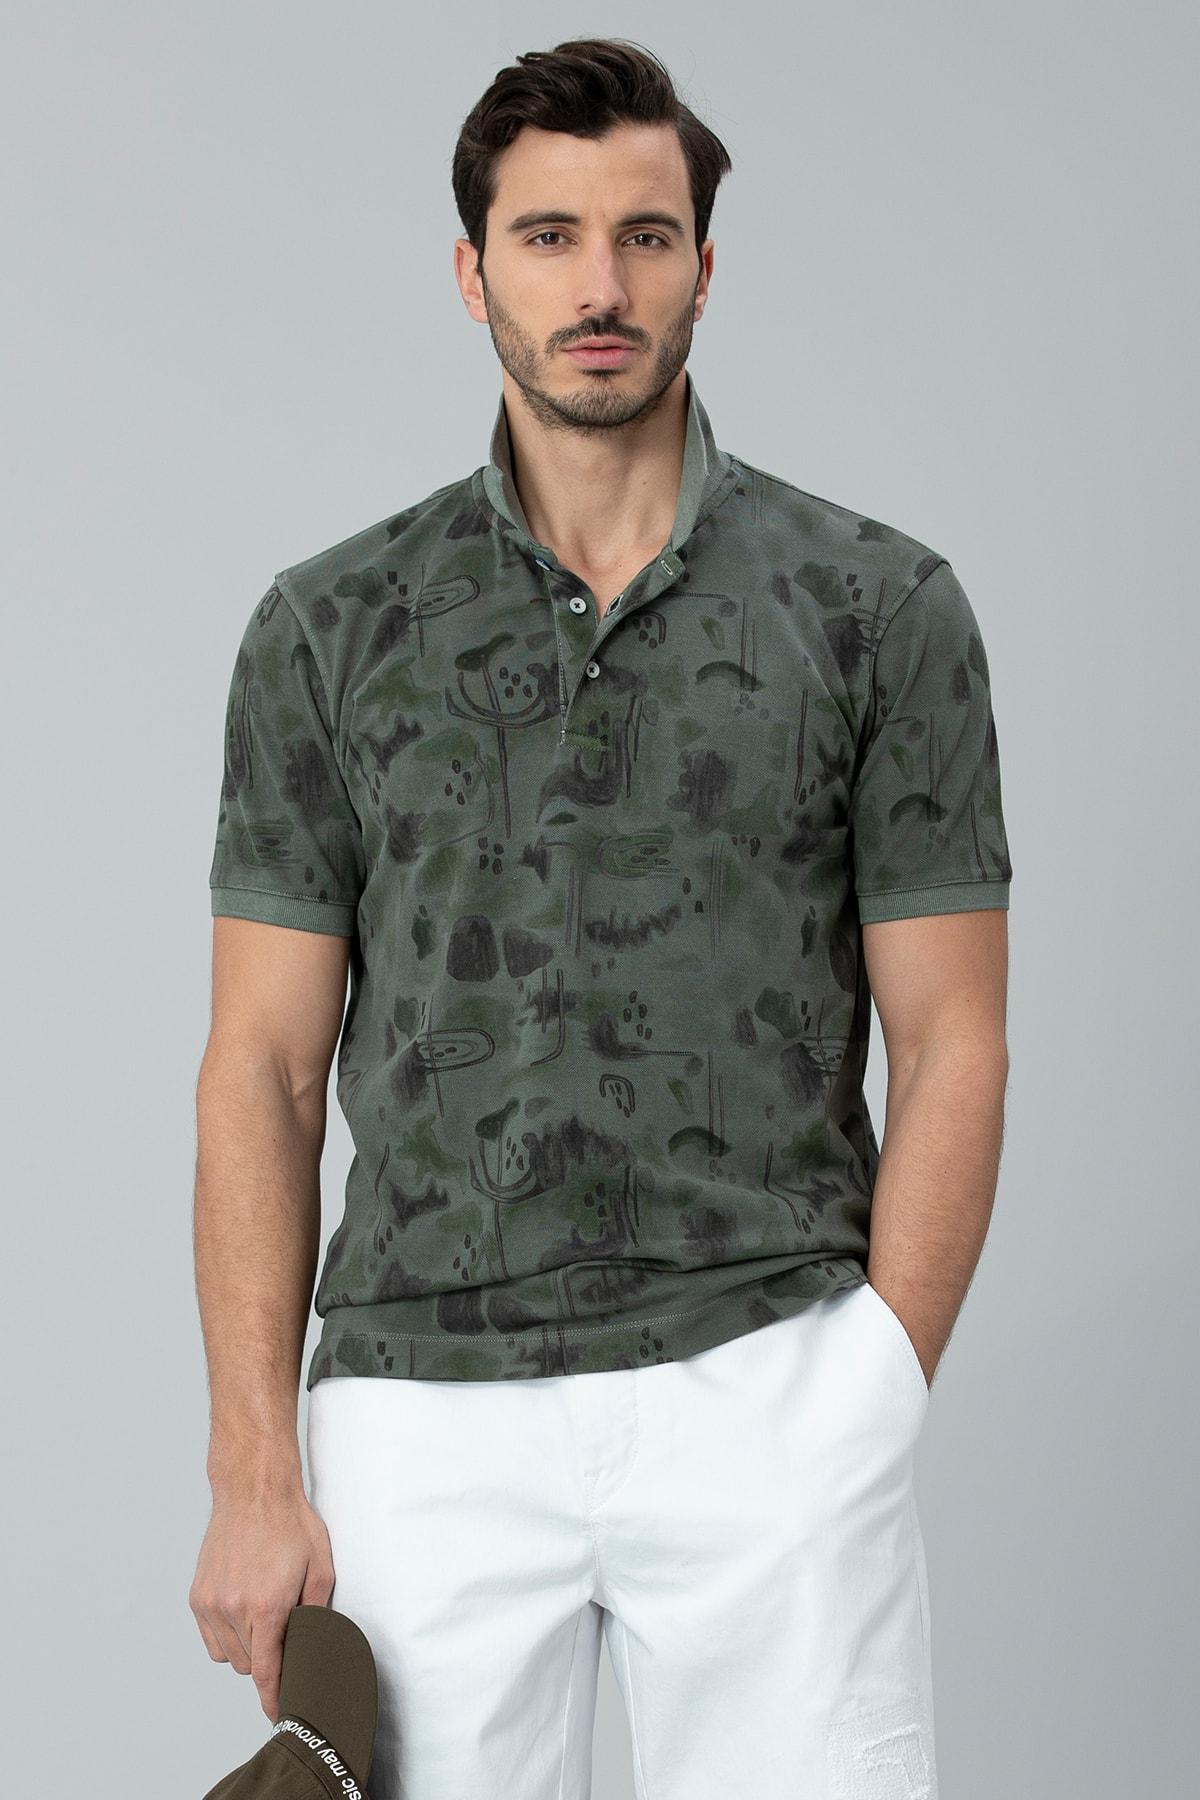 Lufian Brest Spor Polo T- Shirt Açık Yeşil